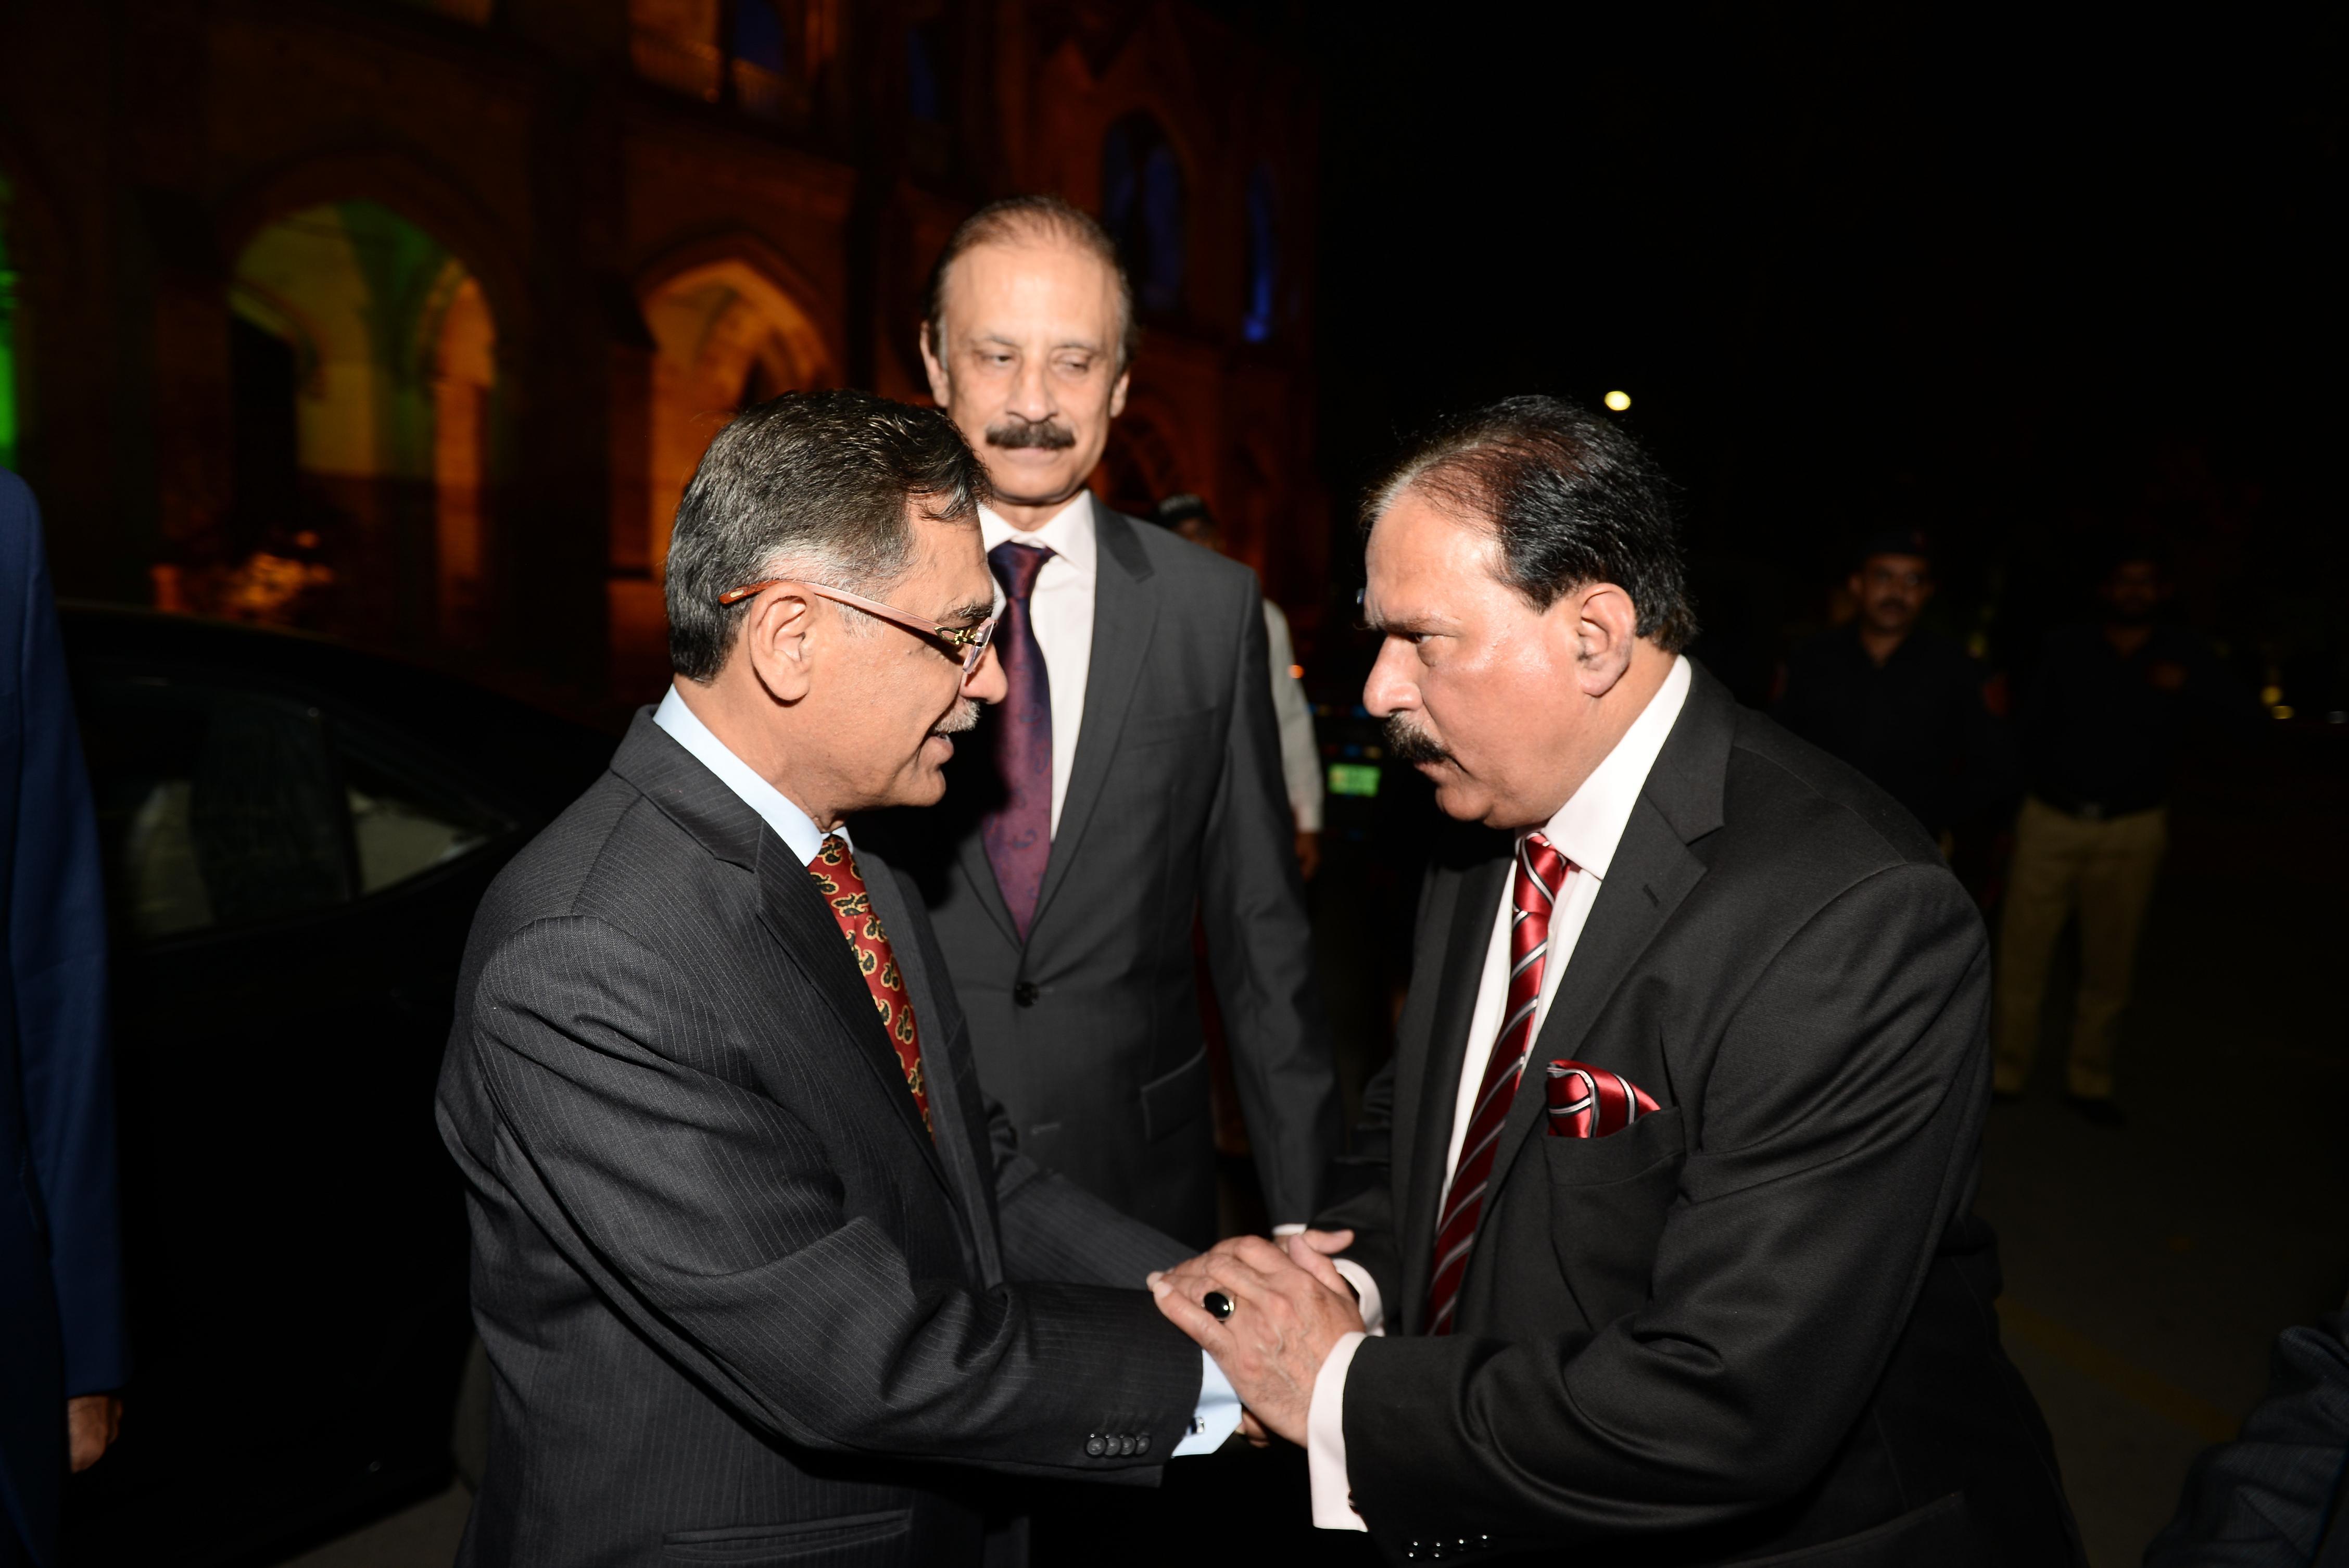 Mr. Kazi Afaq & Justice Saqib Nisar